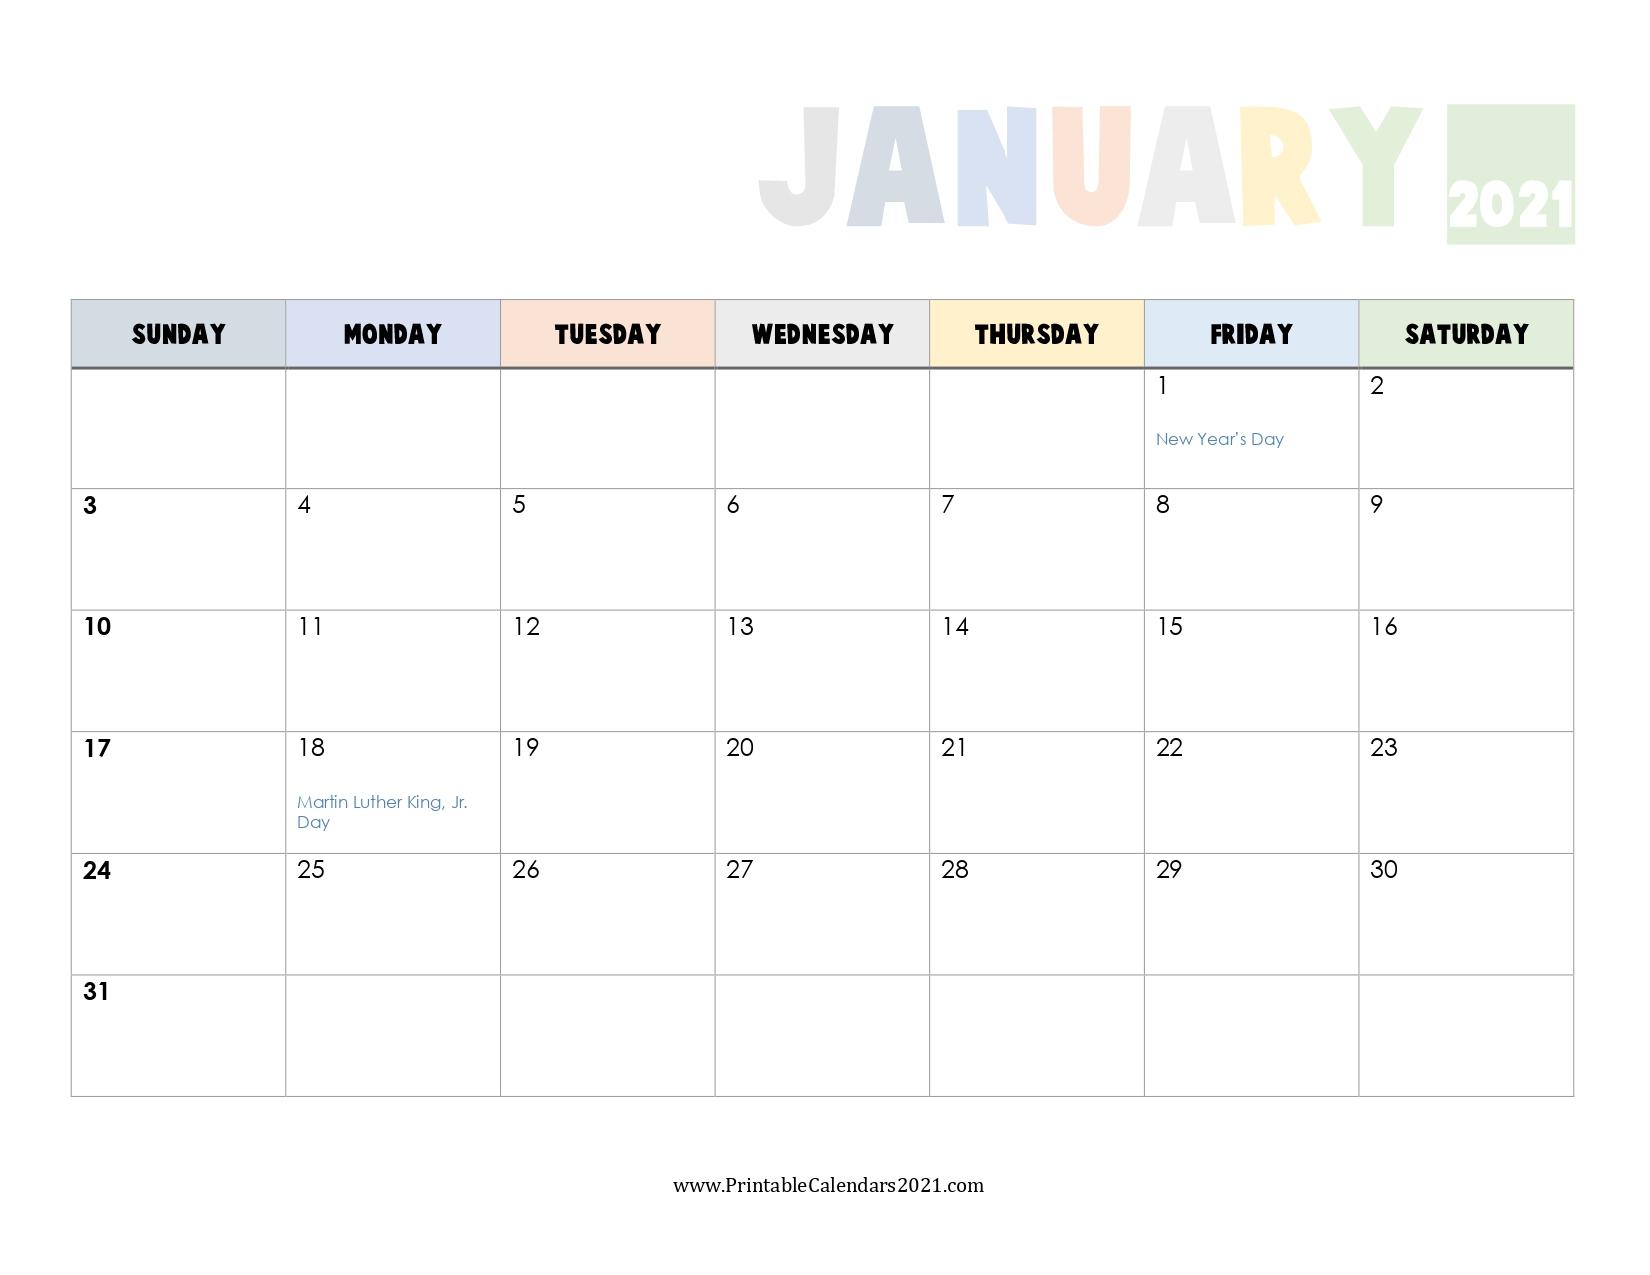 65 Printable Calendar January 2021 Holidays Portrait